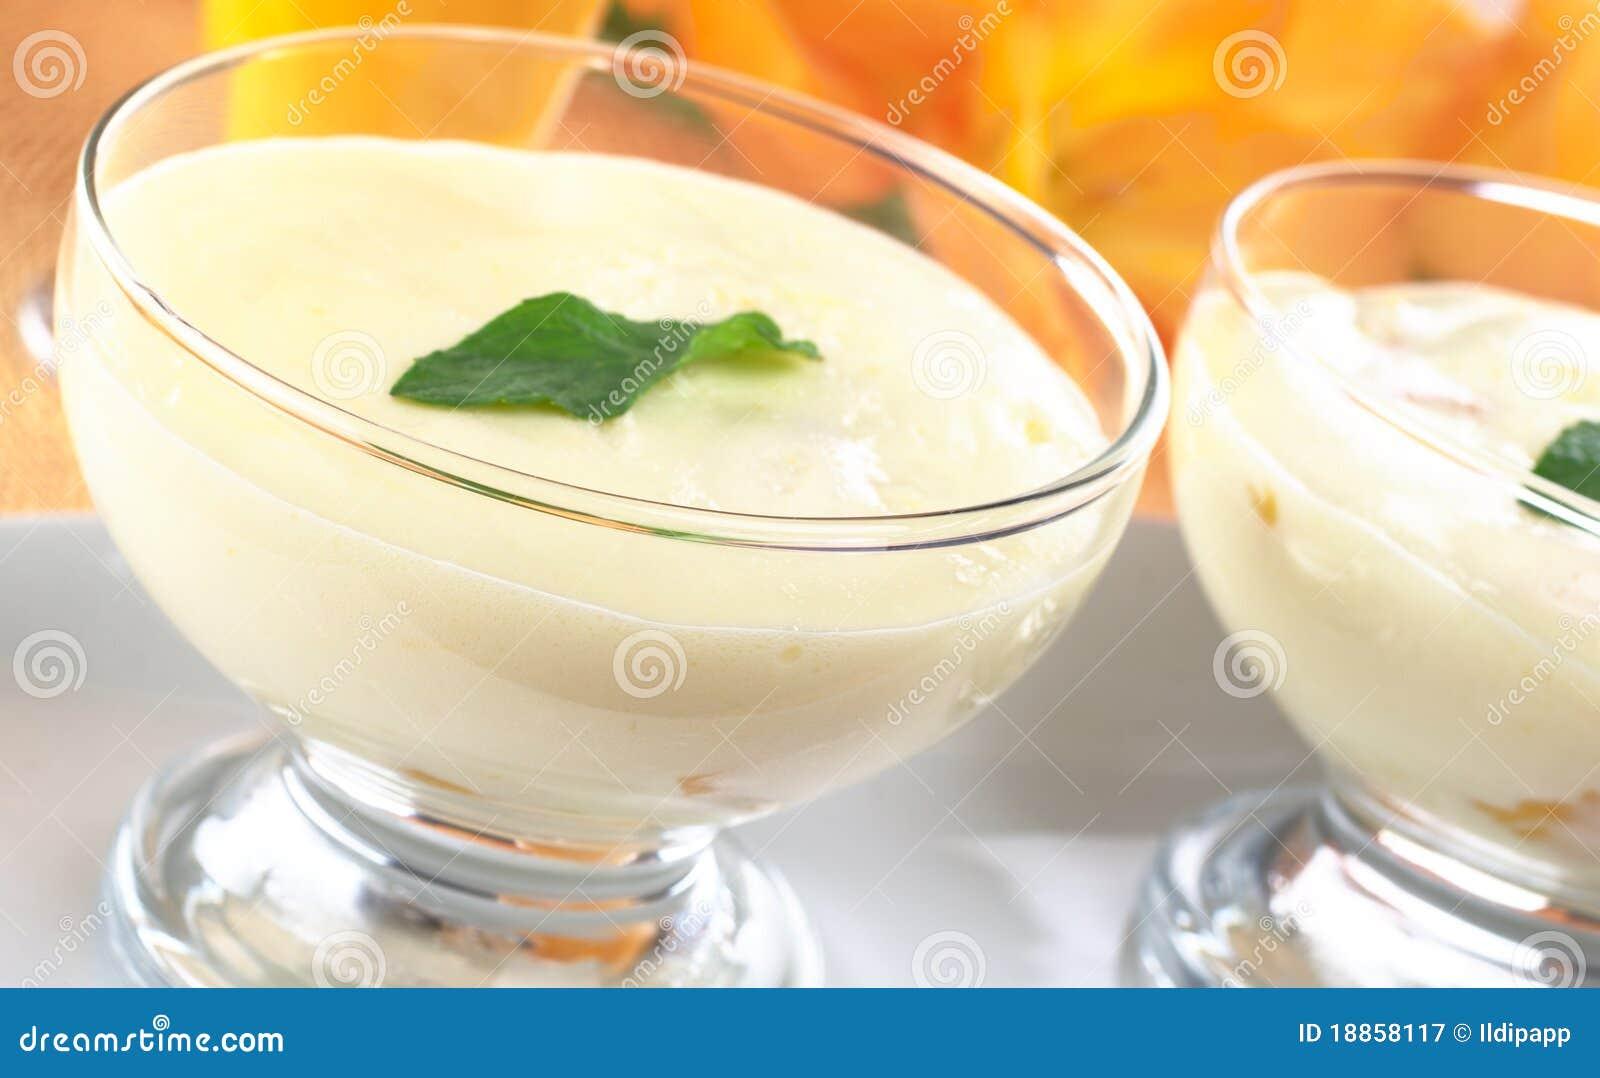 Cream Cheese Dessert Royalty Free Stock Photography